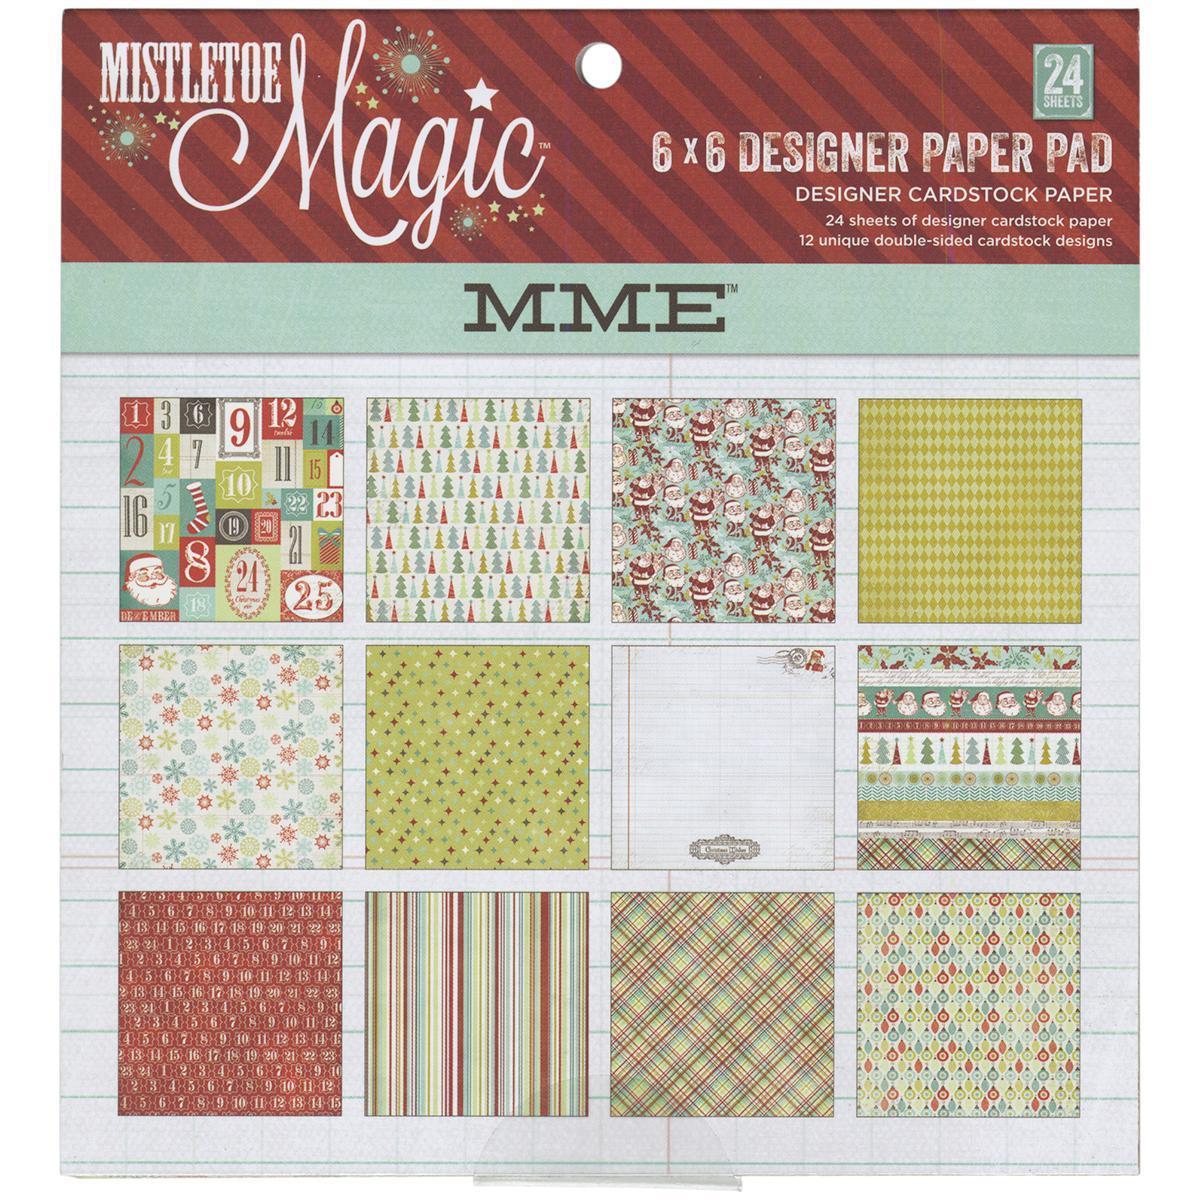 Mistletoe Magic Designer Paper Pad 6 X6  24/Sheets - Double-Sided